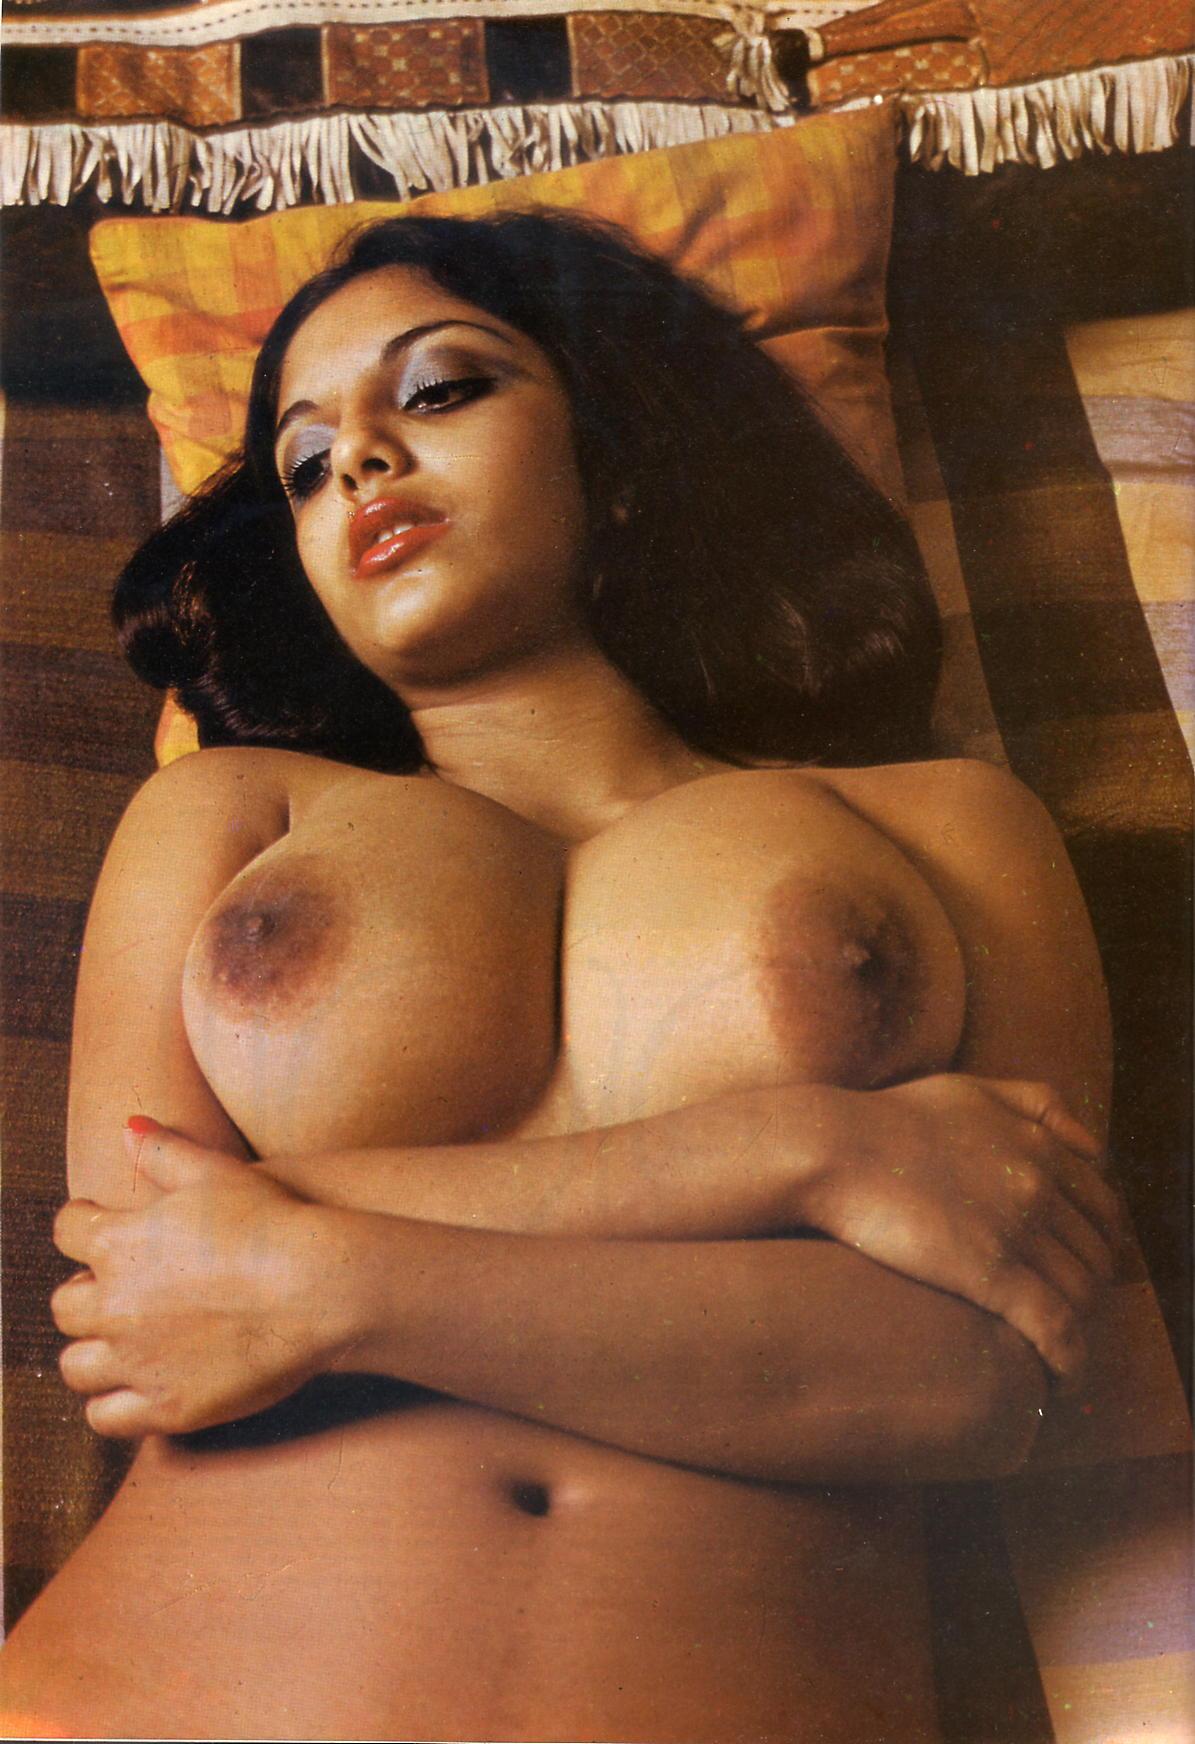 Big ass anal sinnamon love